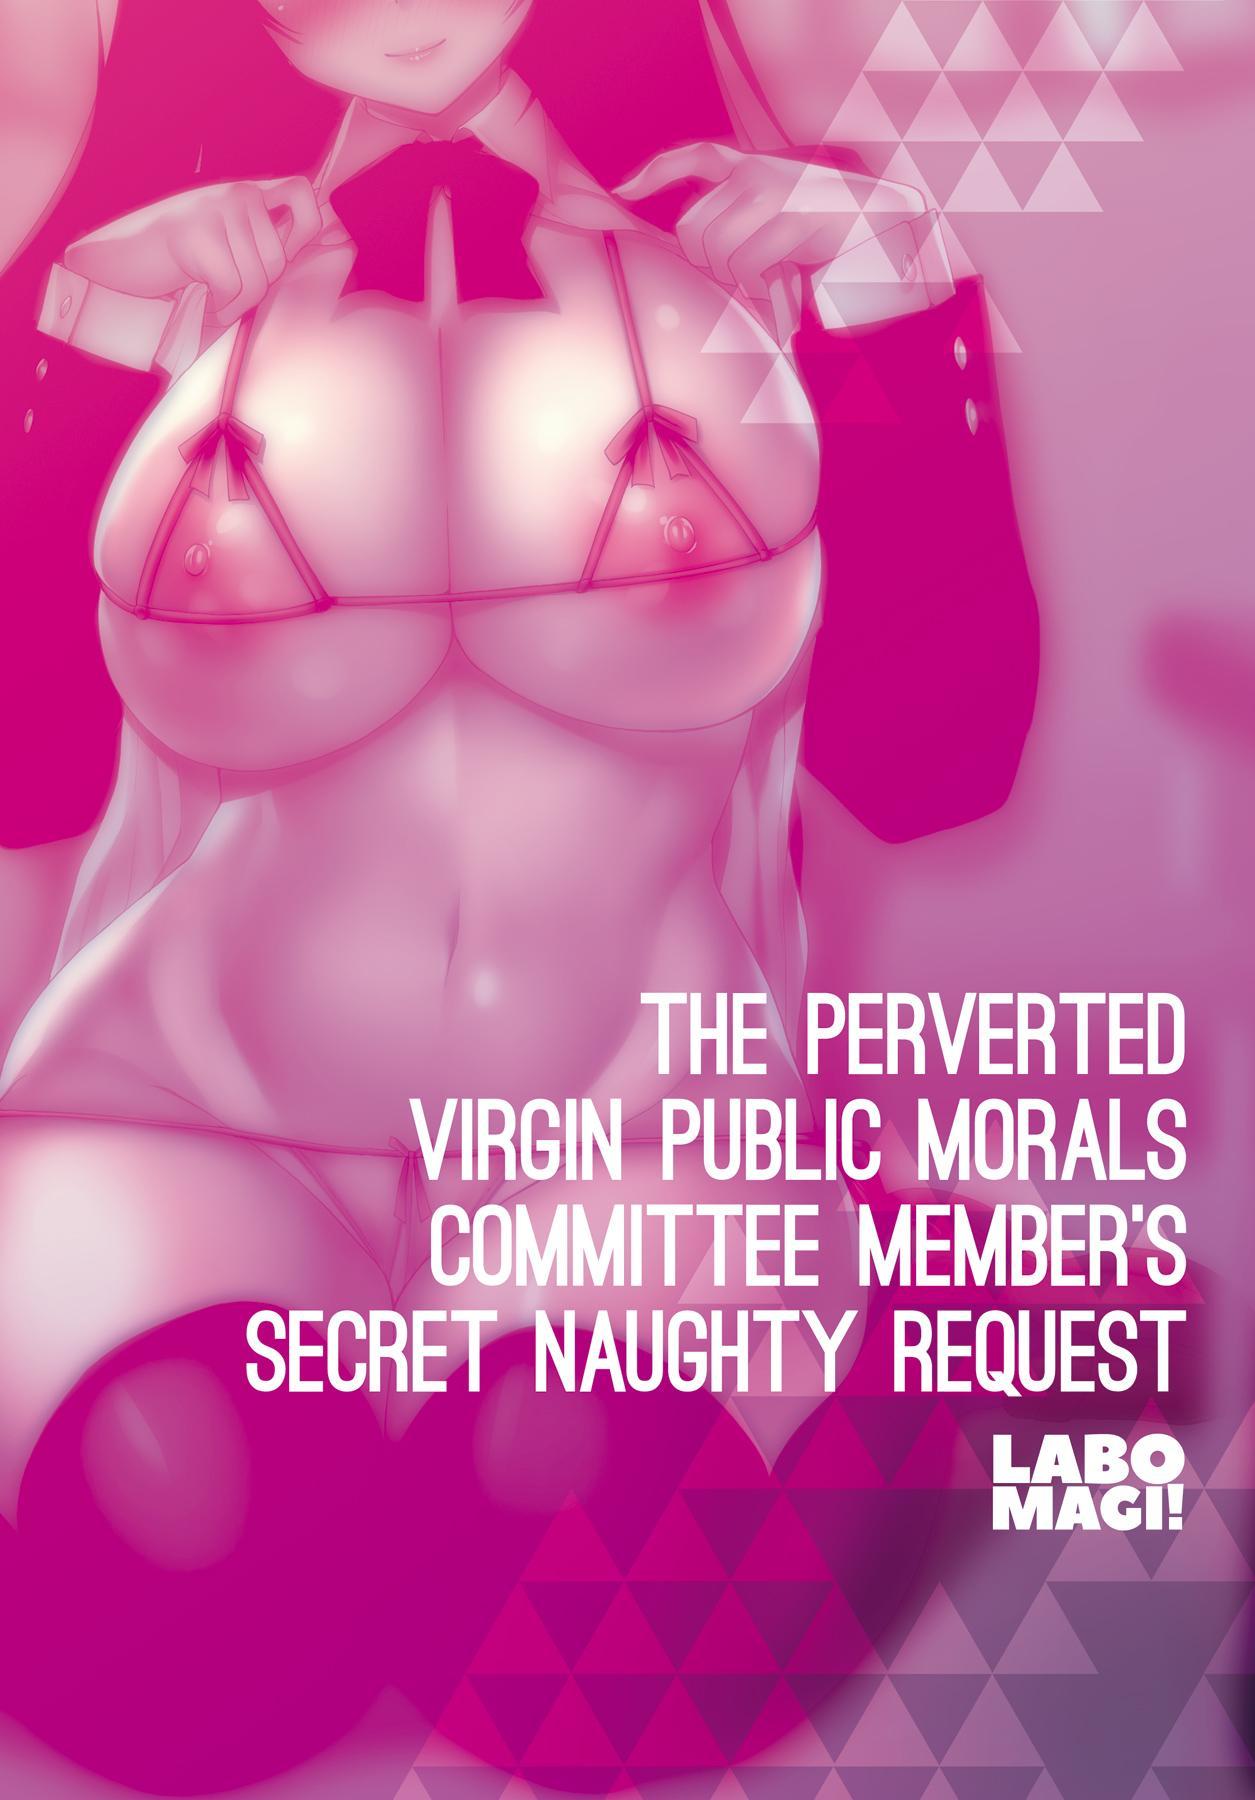 Chishojo Fuuki Iin no Minna ni Ienai Inbi na Onegai   The Perverted Virgin Public Morals Committee Member's Secret Naughty Request 26